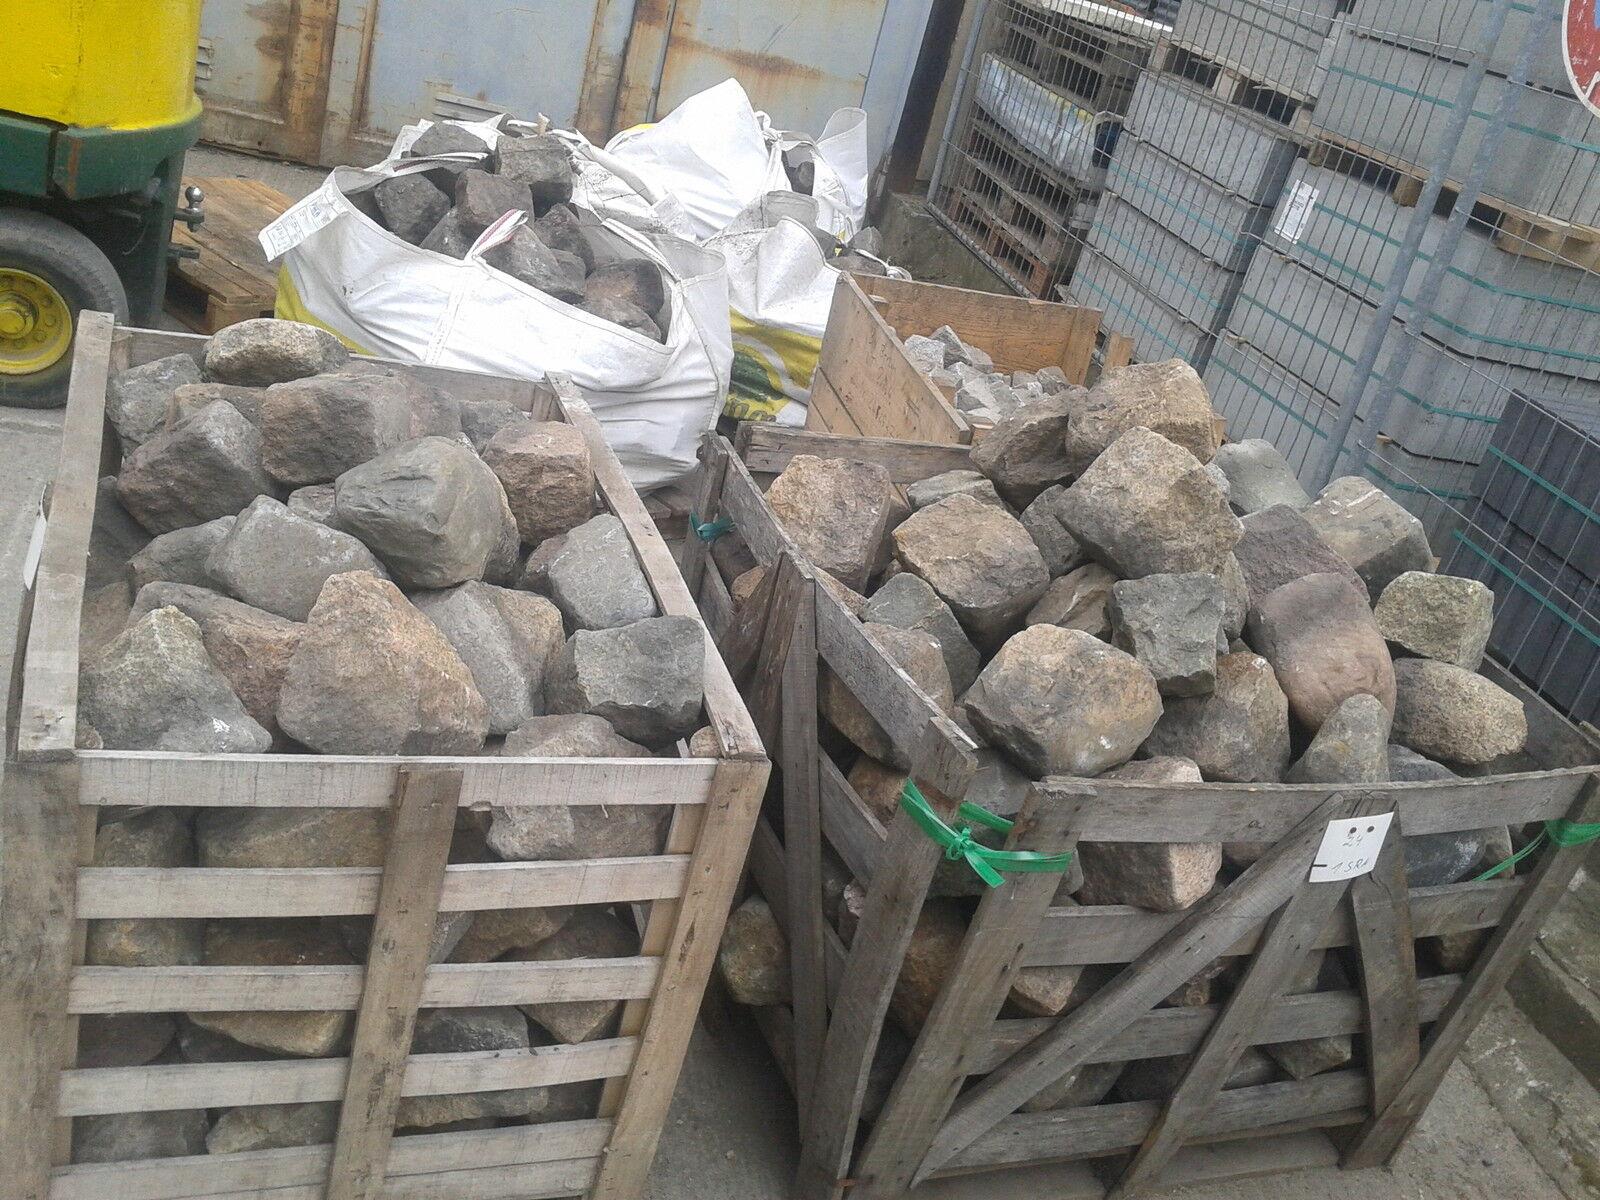 antikes granit gro pflaster granitpflaster stein kopfsteinpflaster pflasterstein eur 1 00. Black Bedroom Furniture Sets. Home Design Ideas